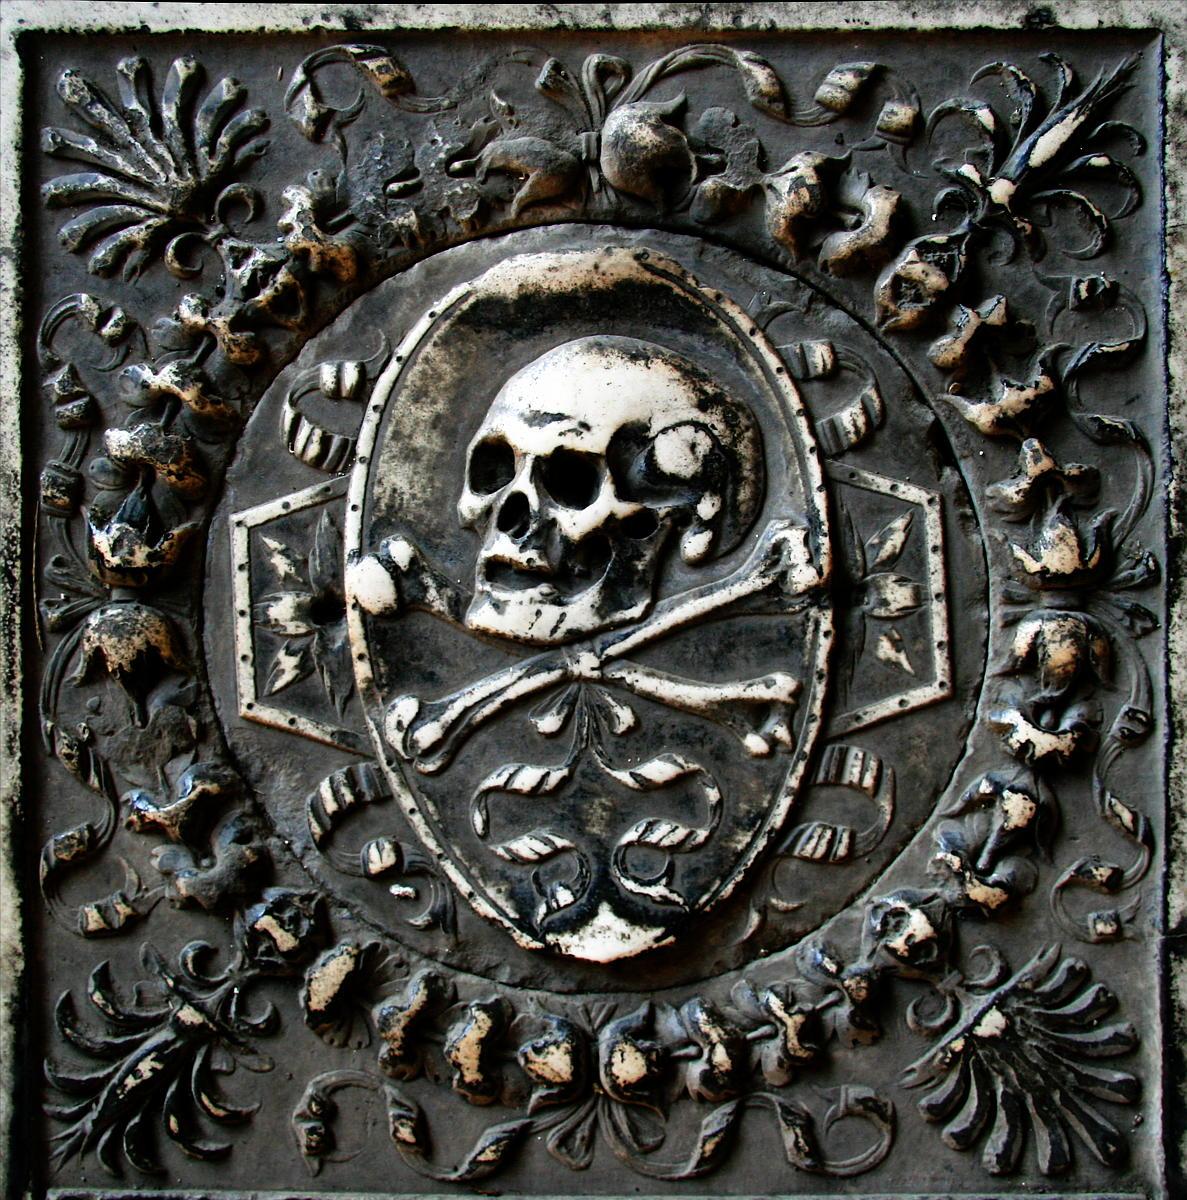 Stone skull and crossbones by barefootliam-stock